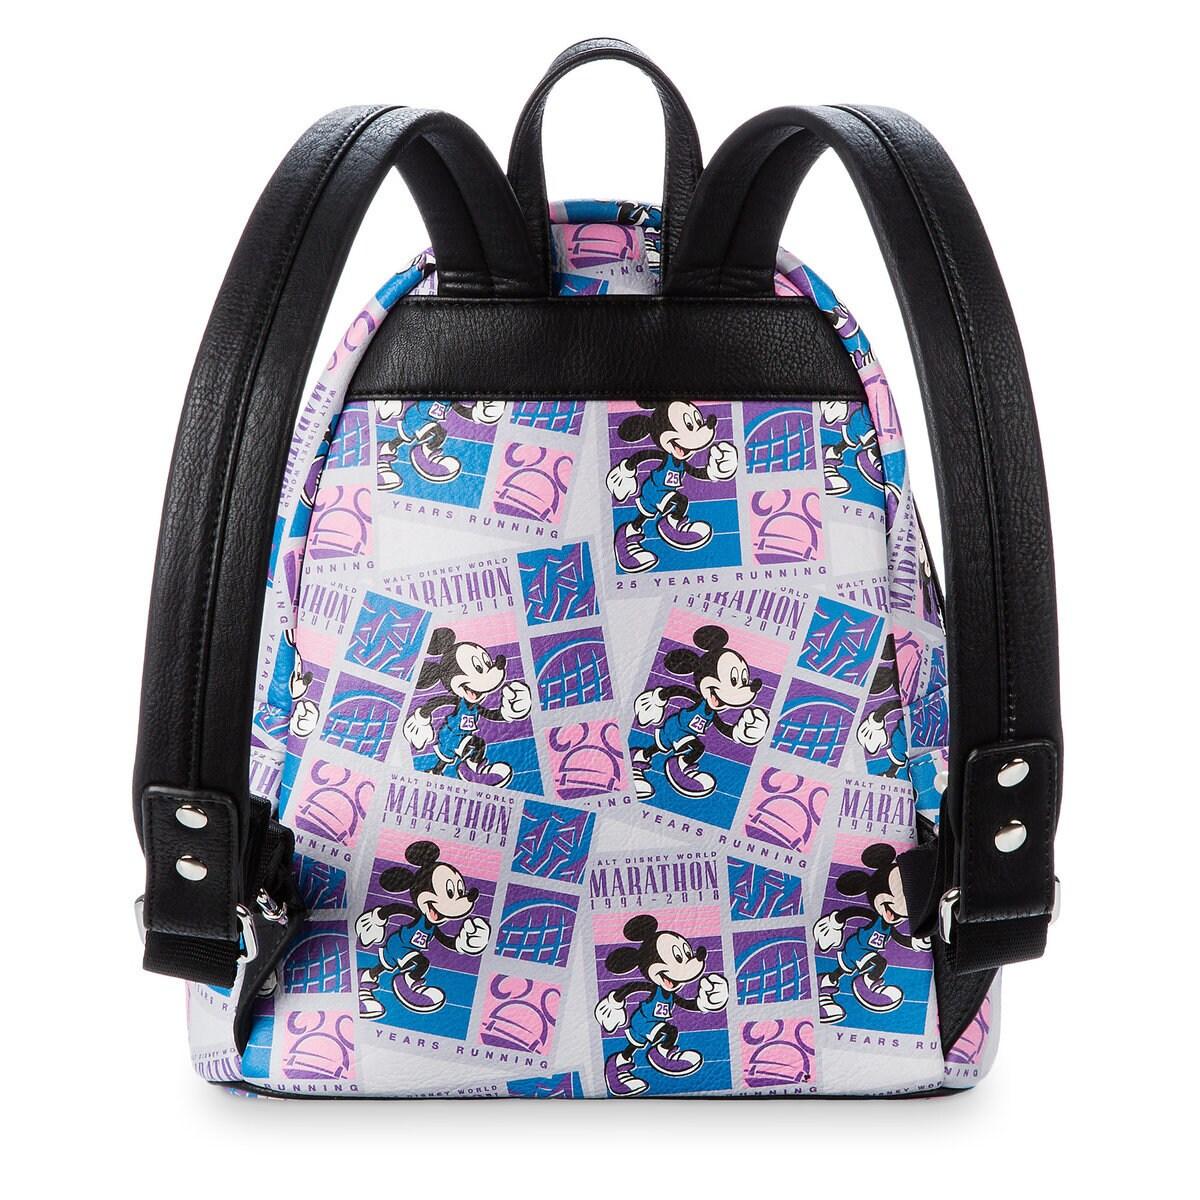 91602d459f5 Mickey Mouse runDisney Marathon Backpack by Loungefly - Walt Disney World